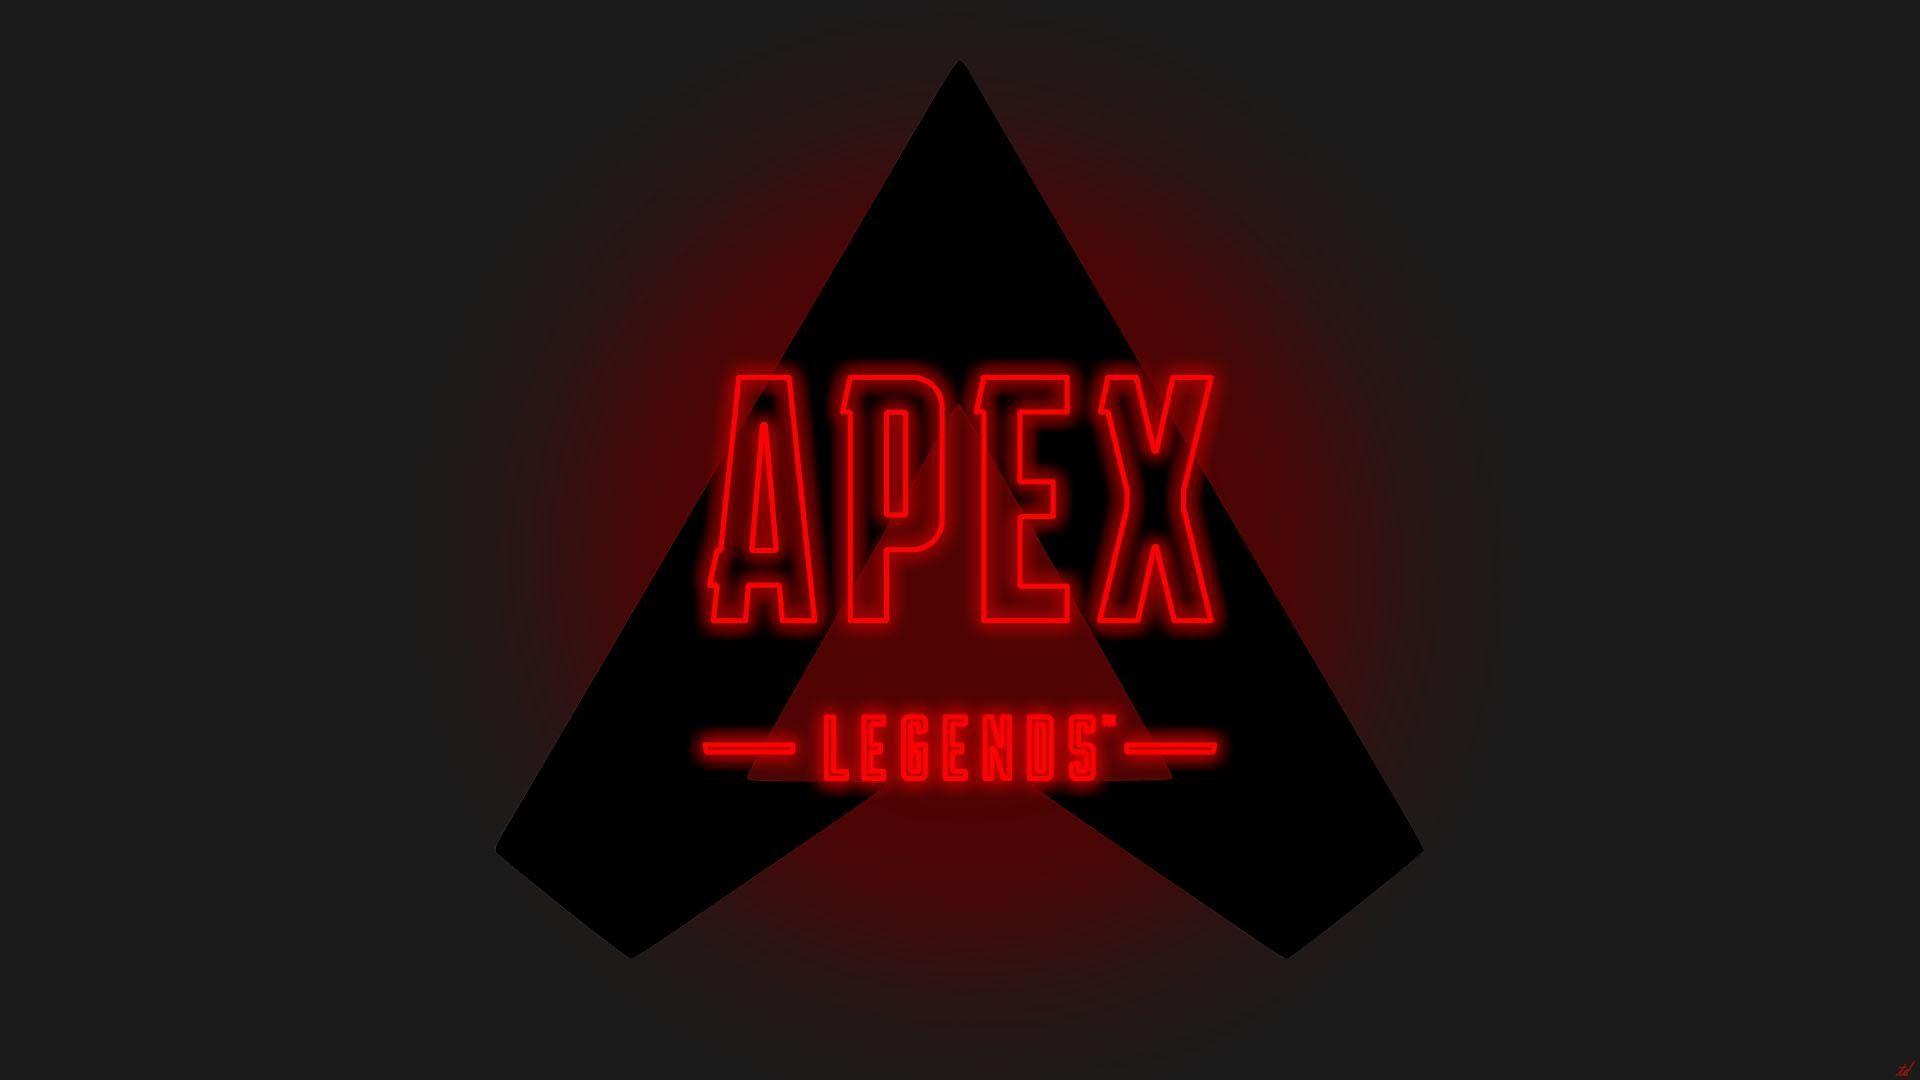 apex legends mobile wallpaper